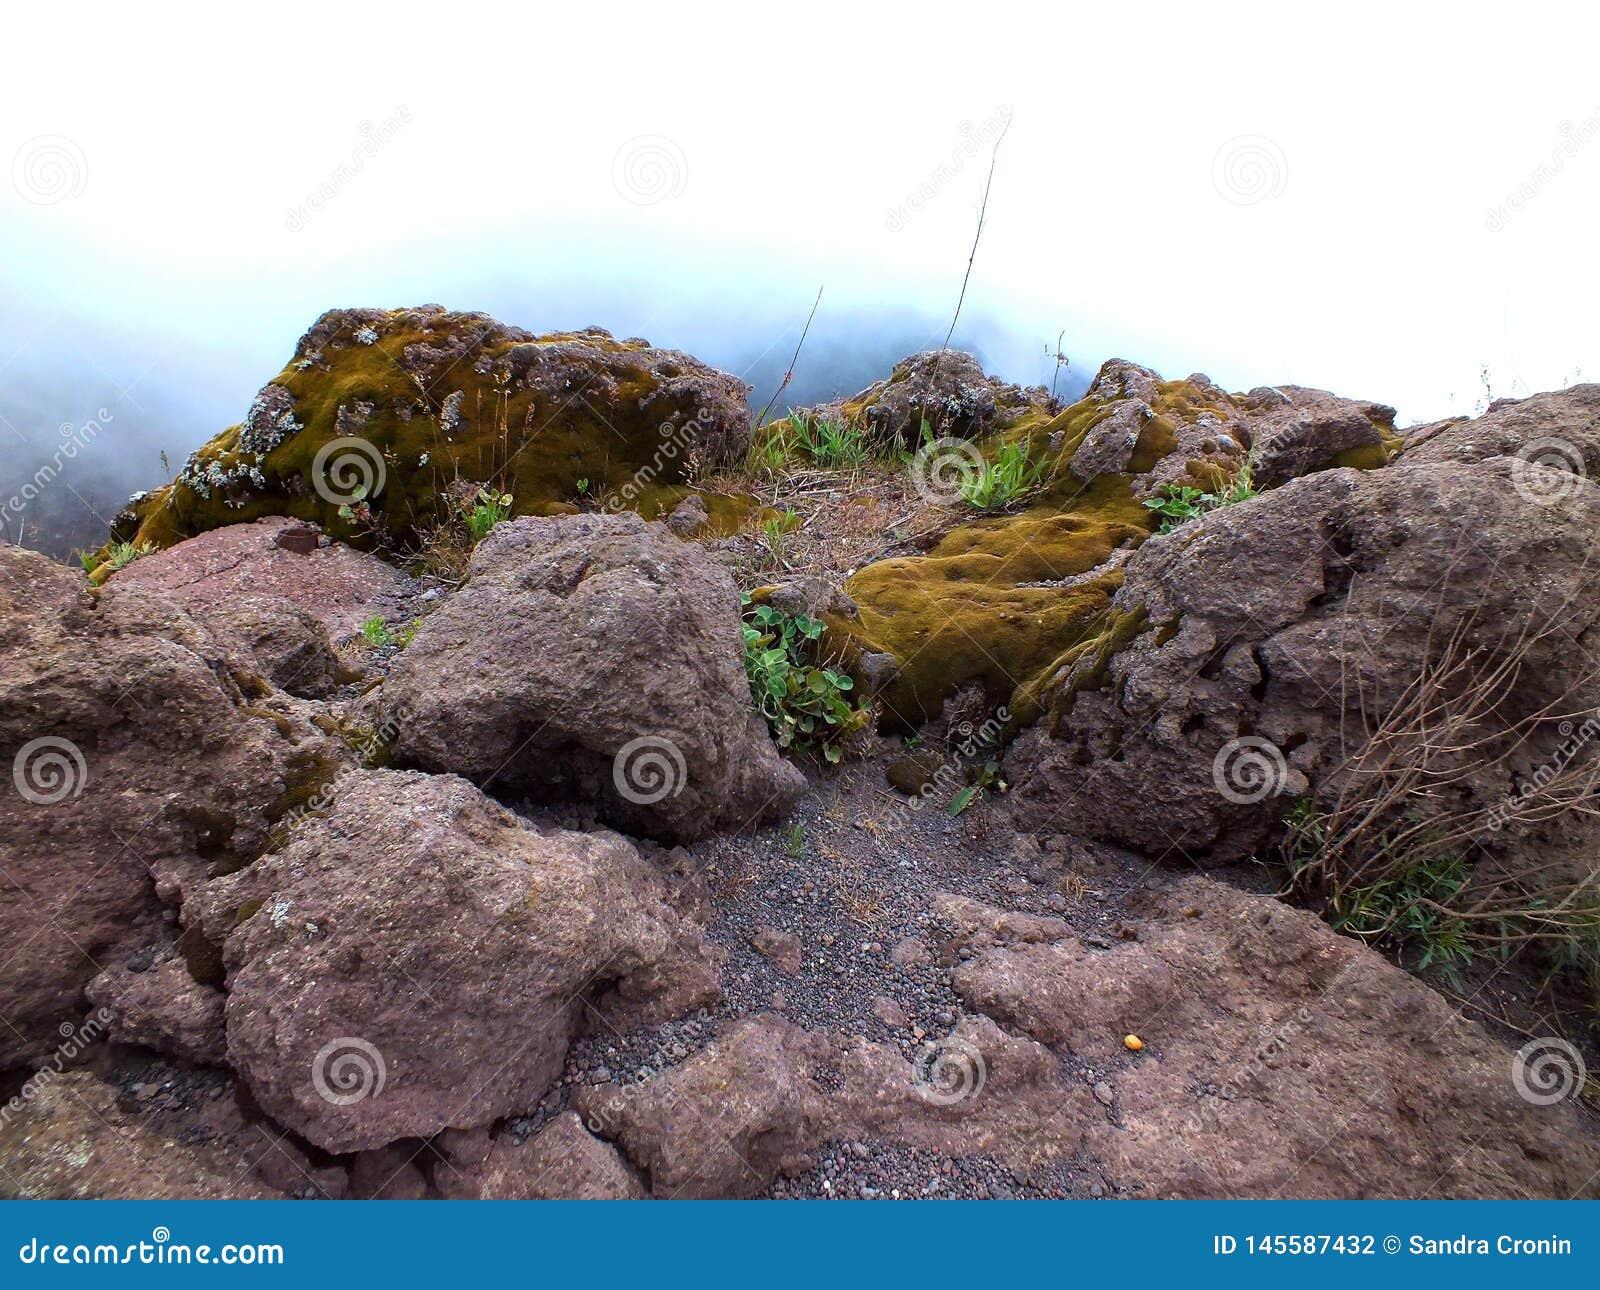 The rocks of Mount Vesuvius